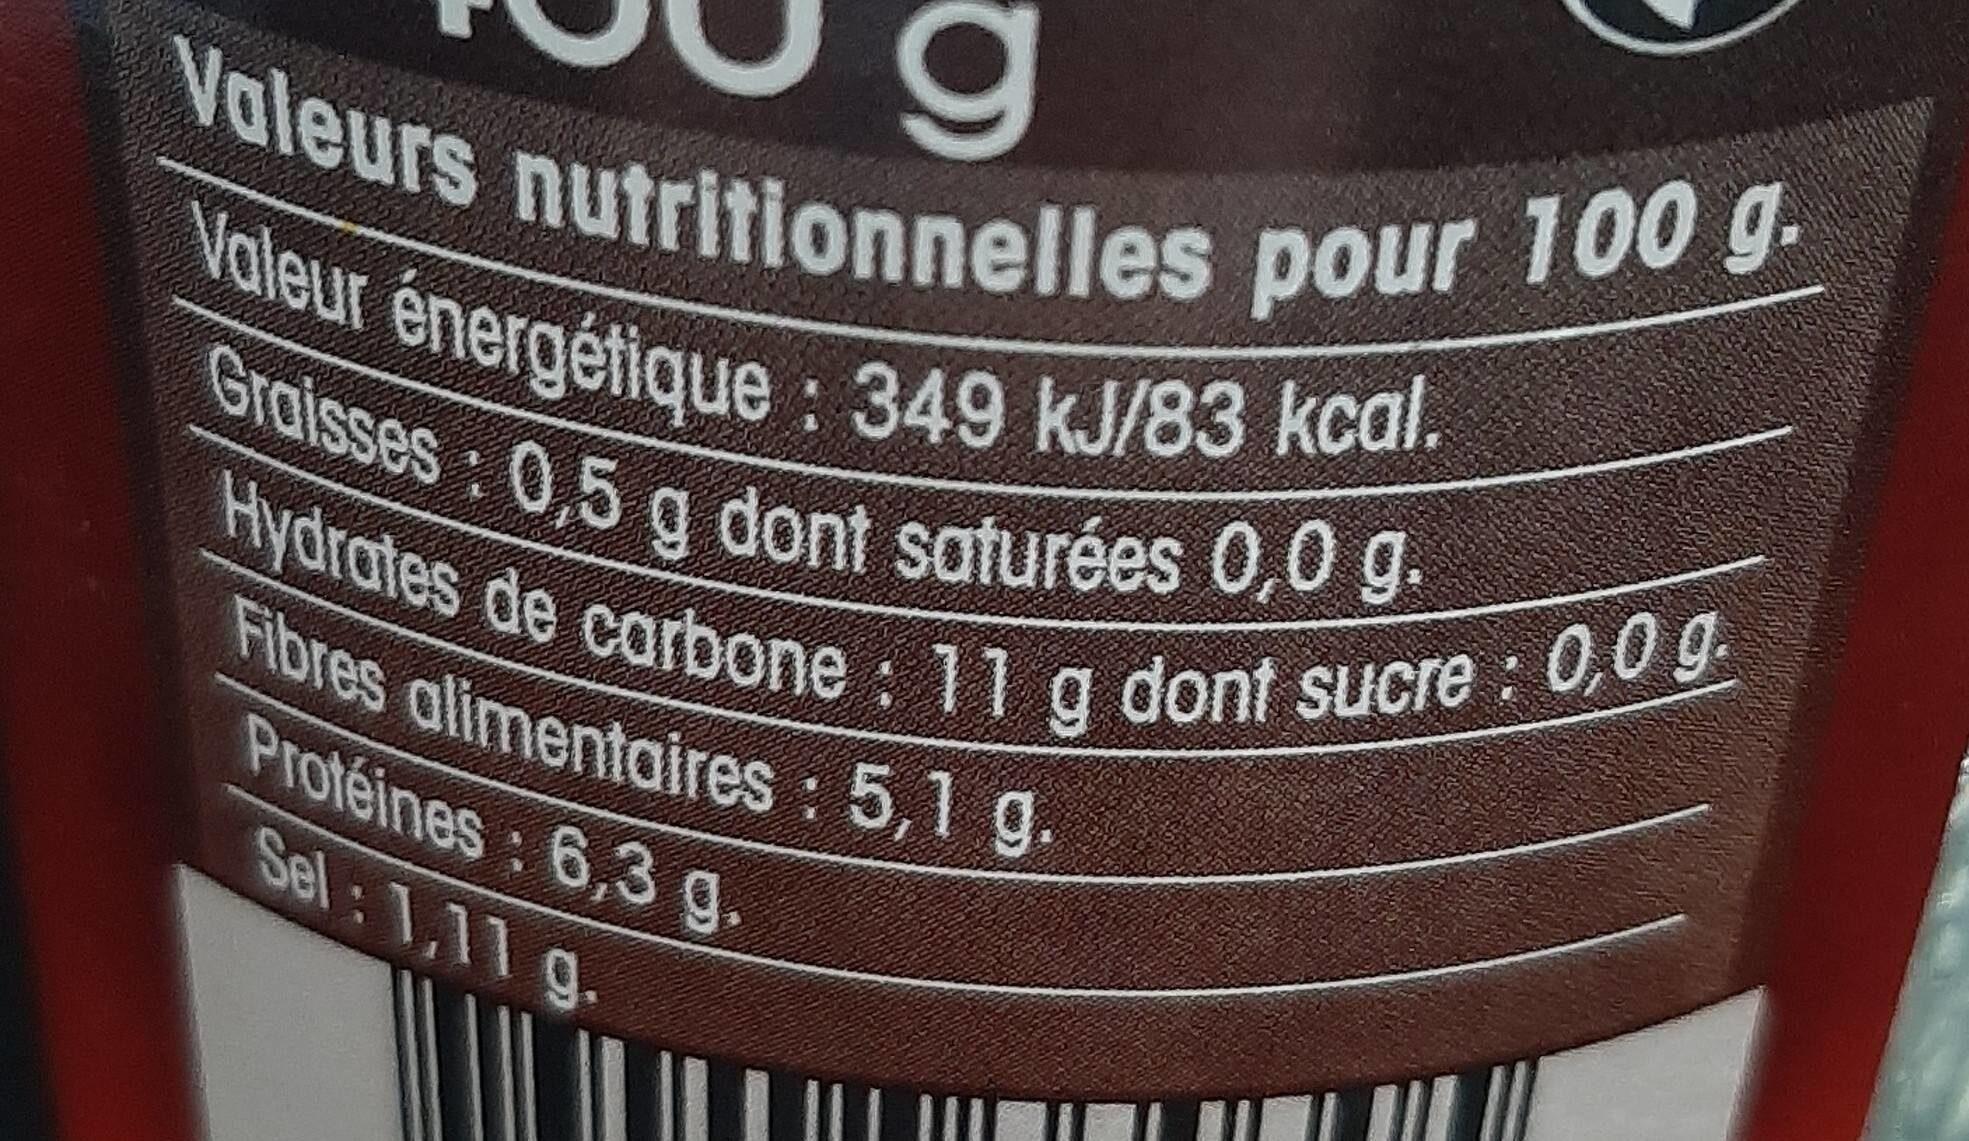 Lentilles MONTPERAL - Informations nutritionnelles - fr